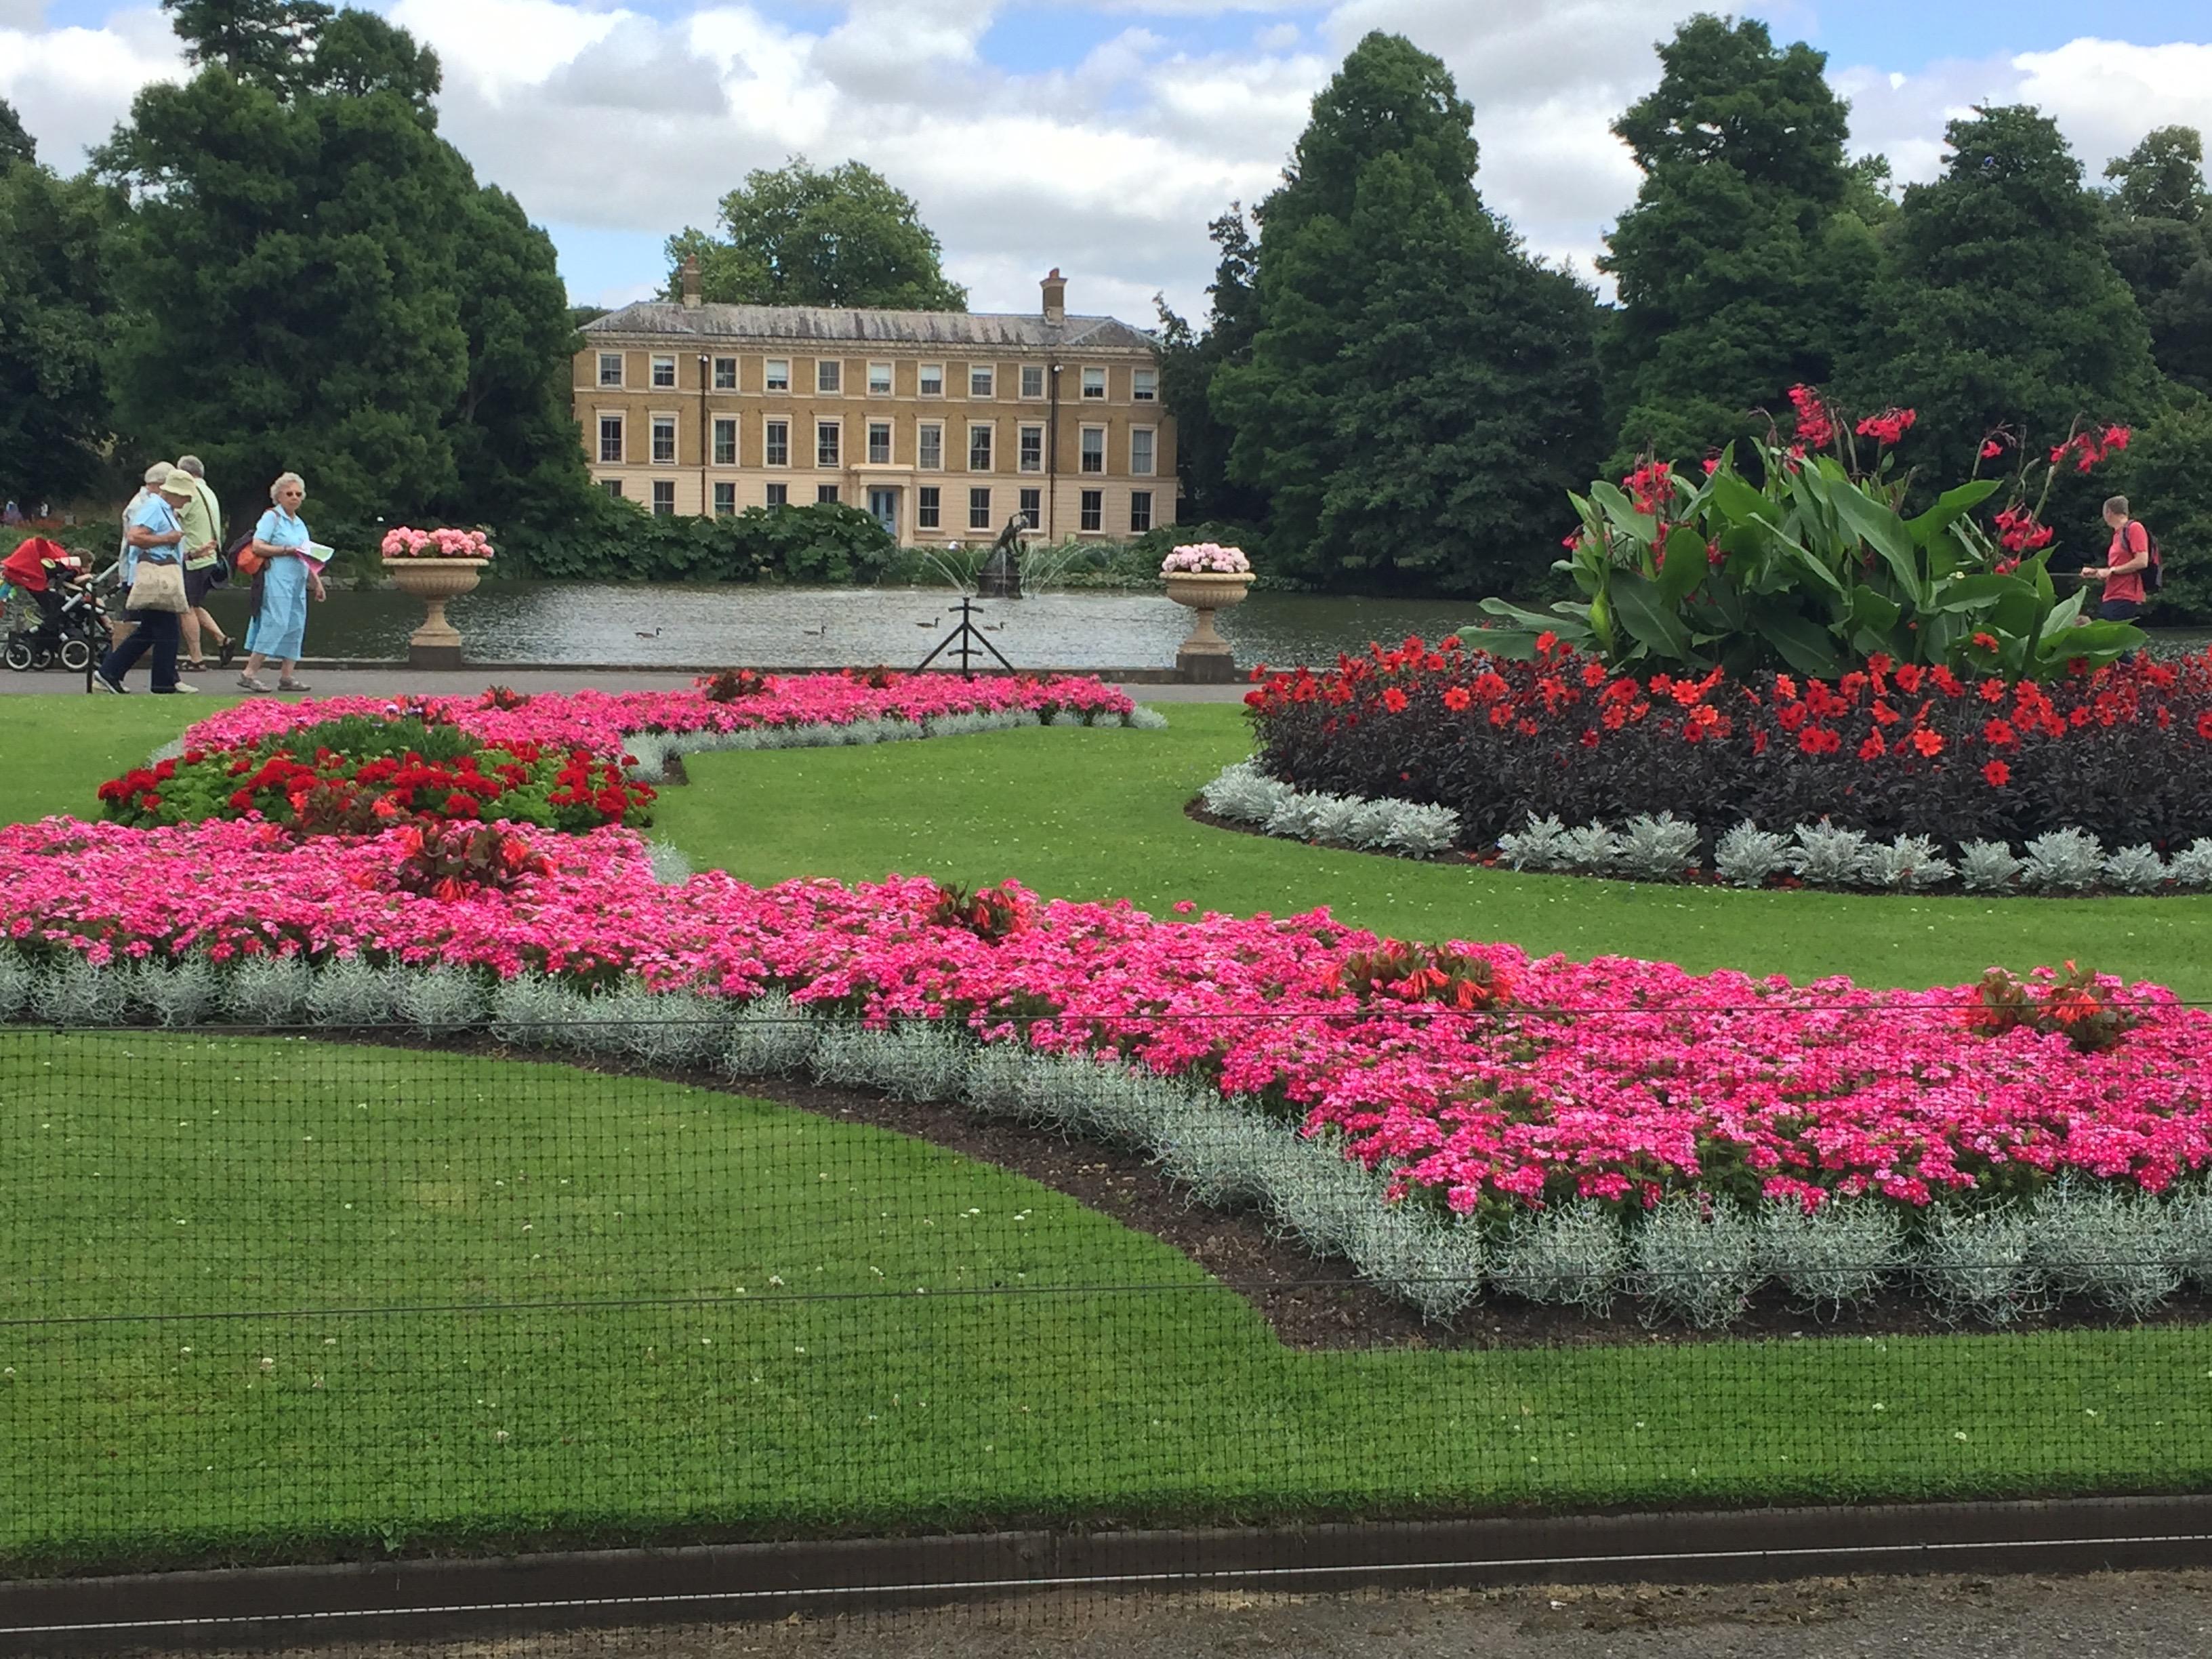 A visit to Kew Gardens